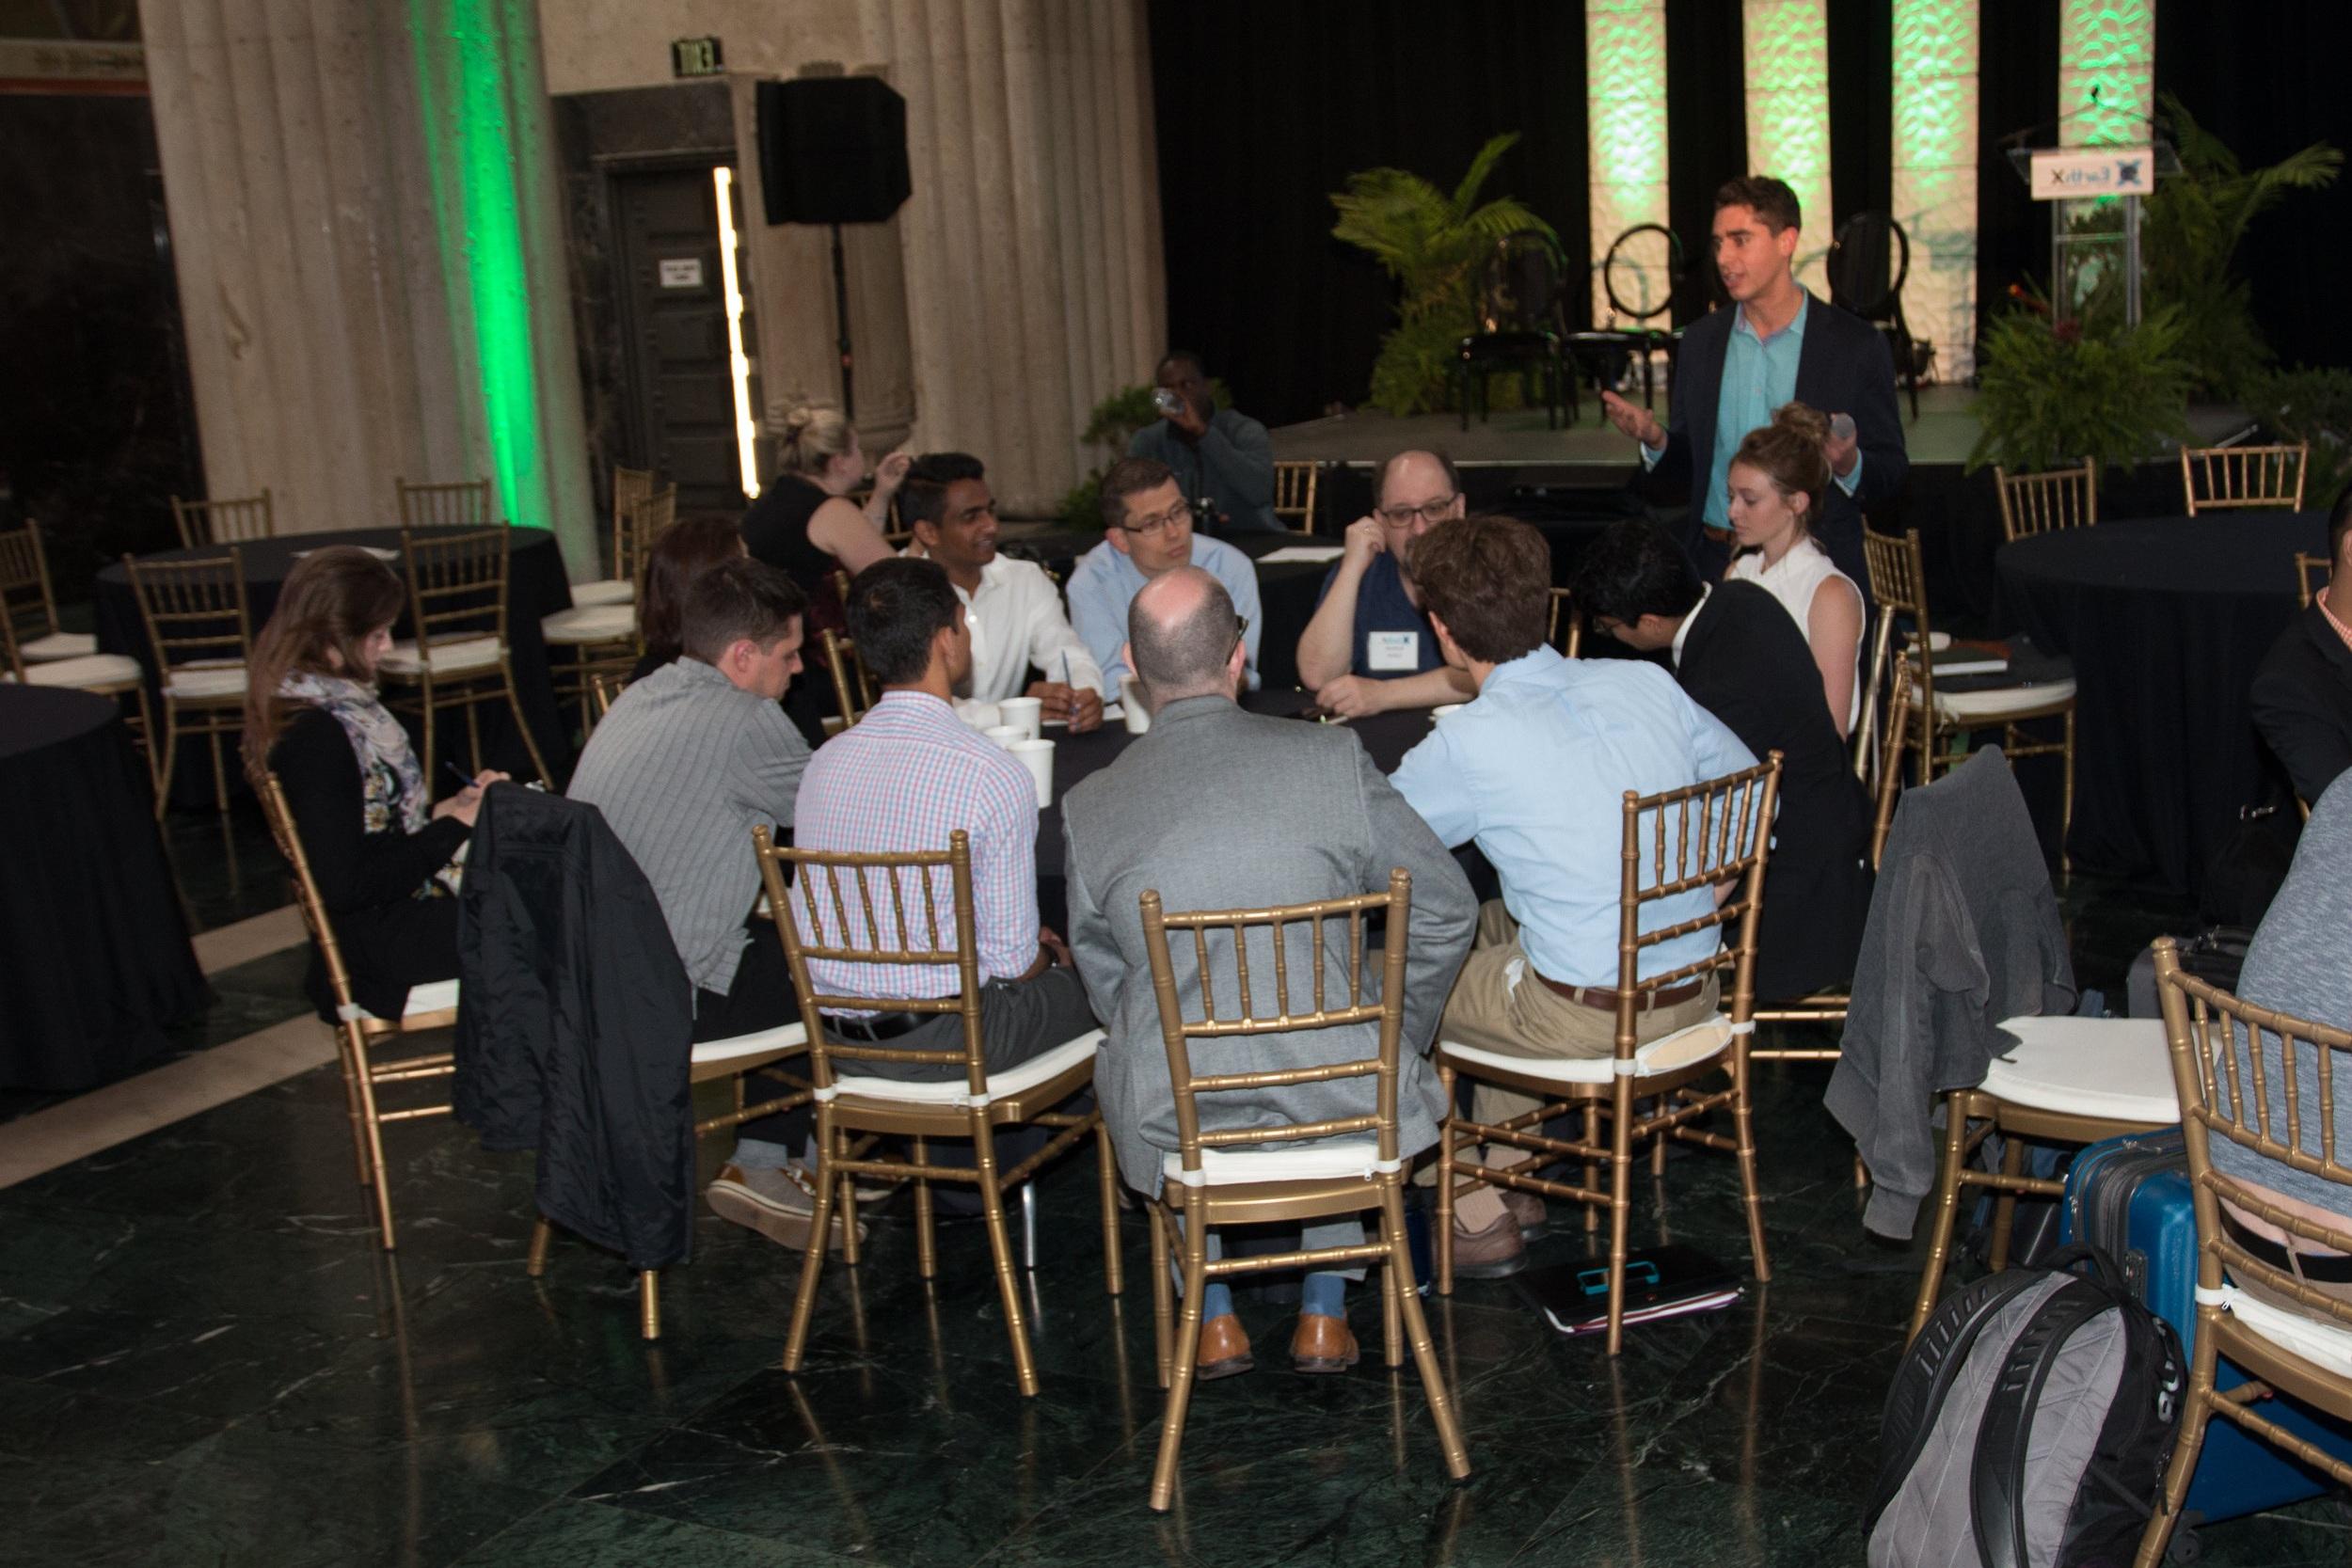 2018-04-22 - EarthX Bridge Summit Conference (JS) 068.jpg